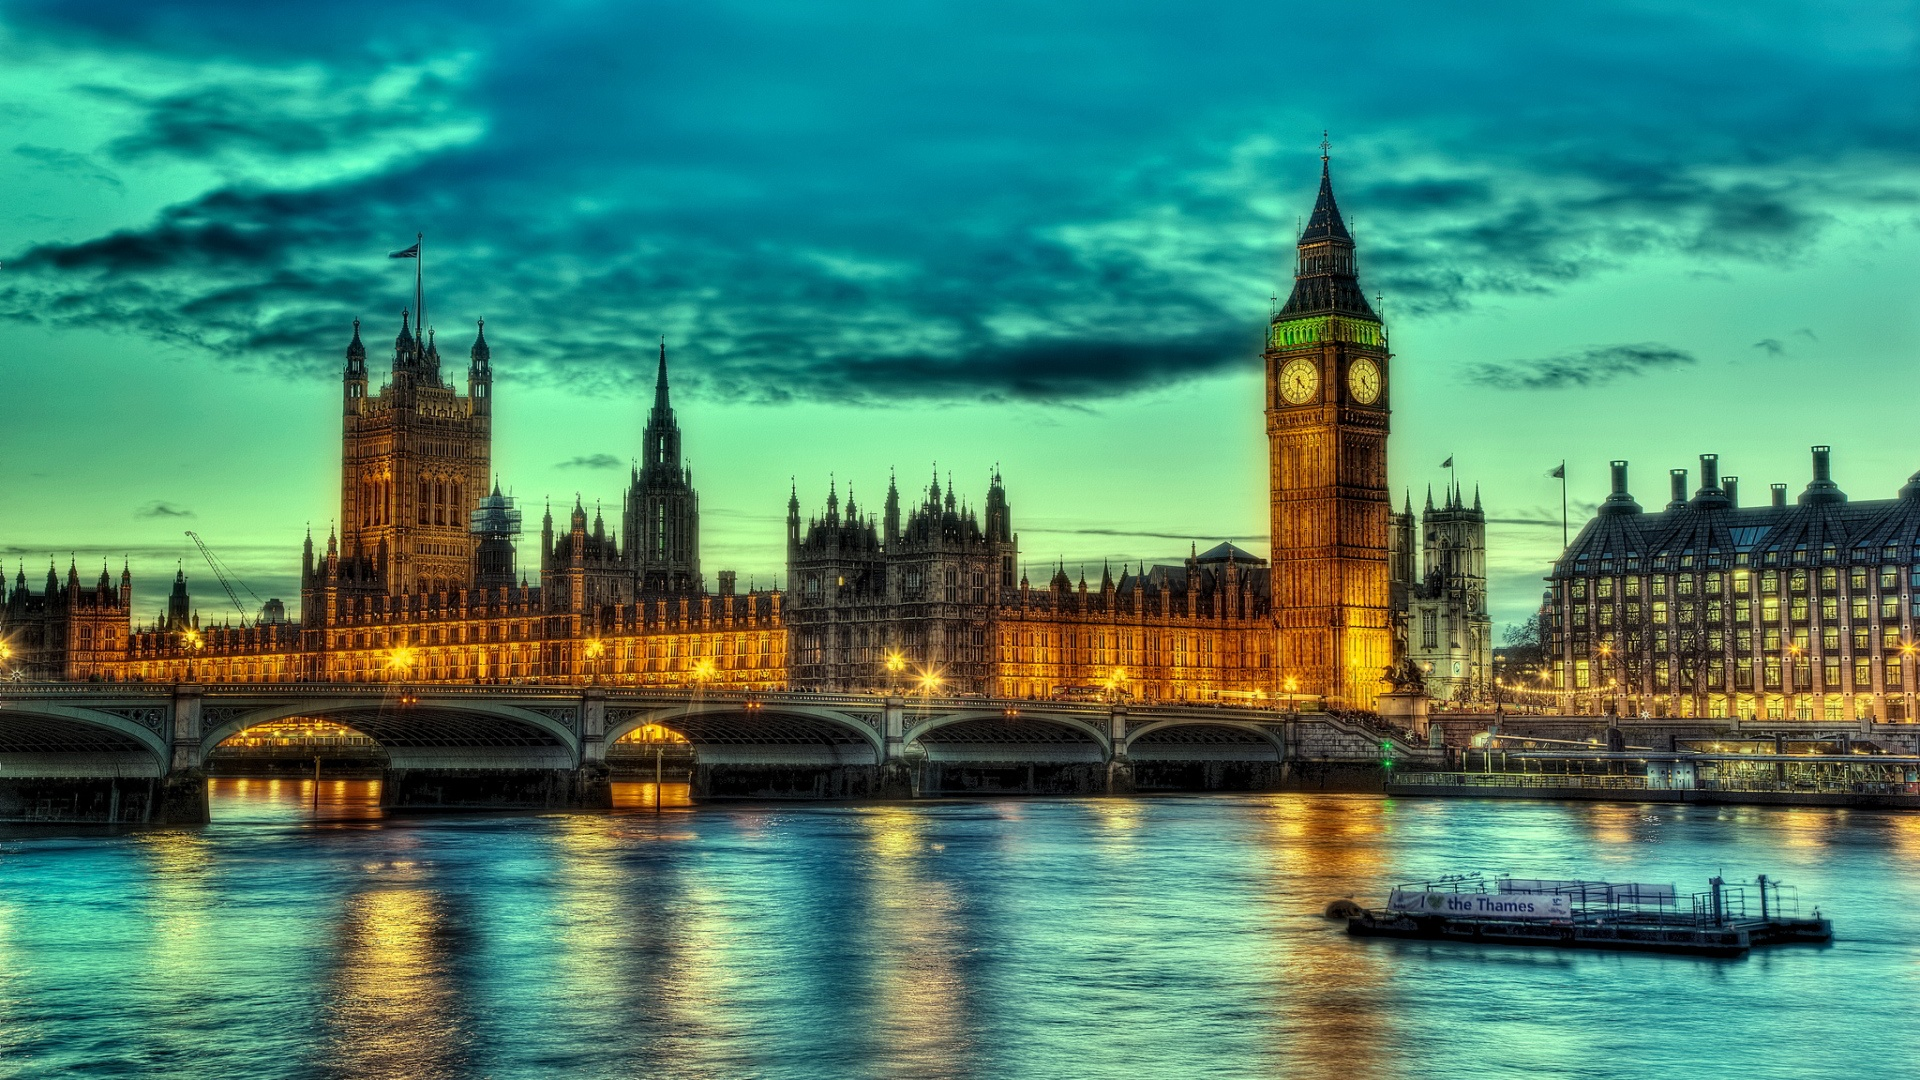 London England Wallpaper PC Wallpaper | WallpaperLepi